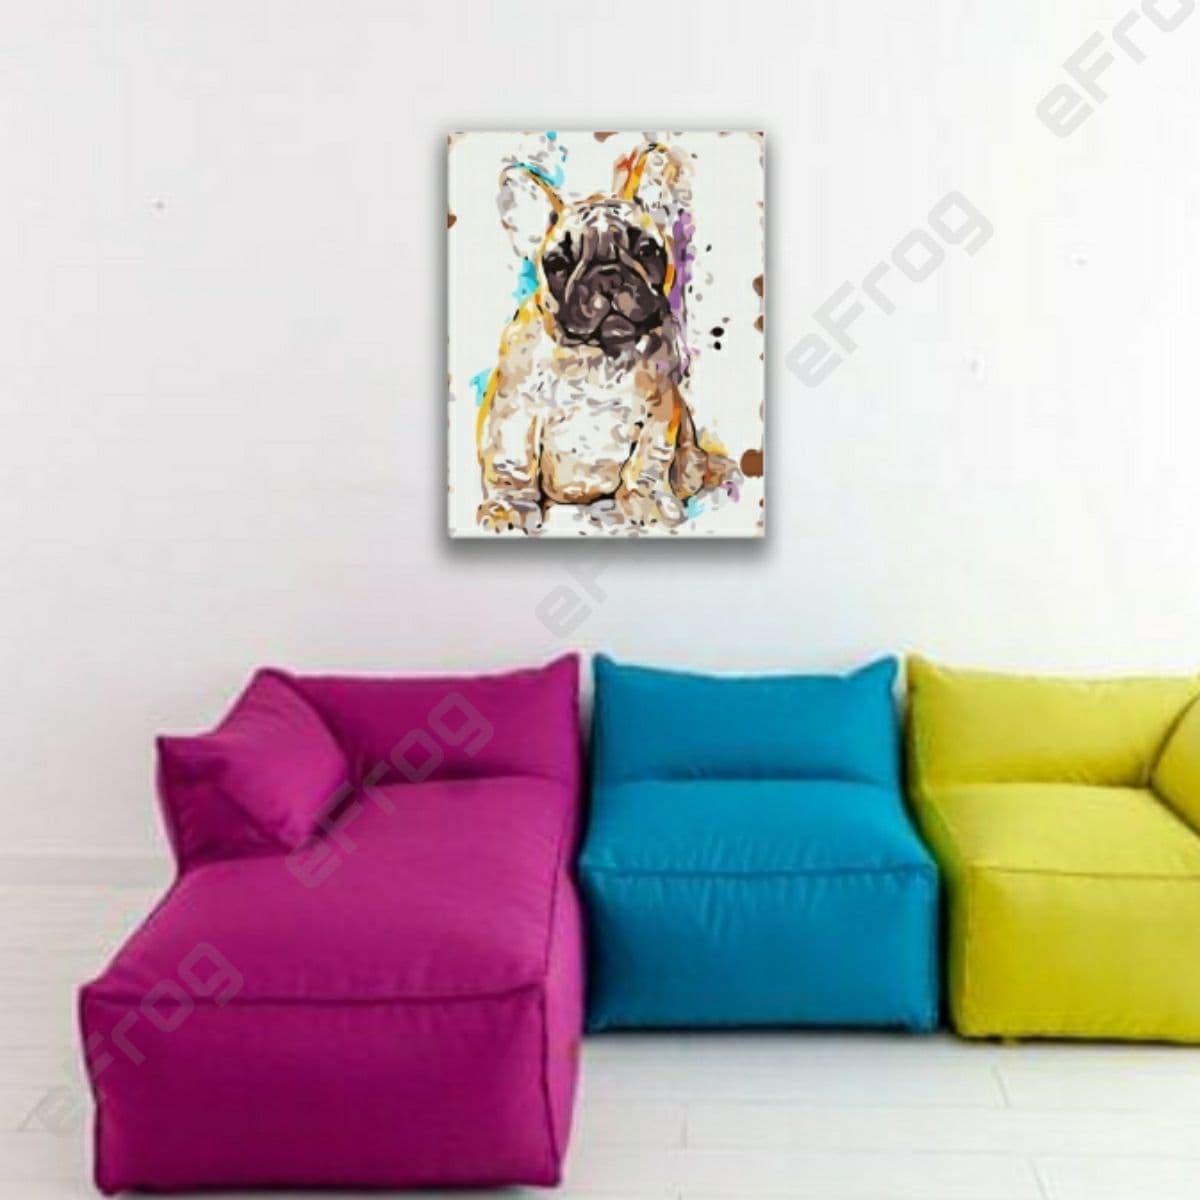 The Dog1